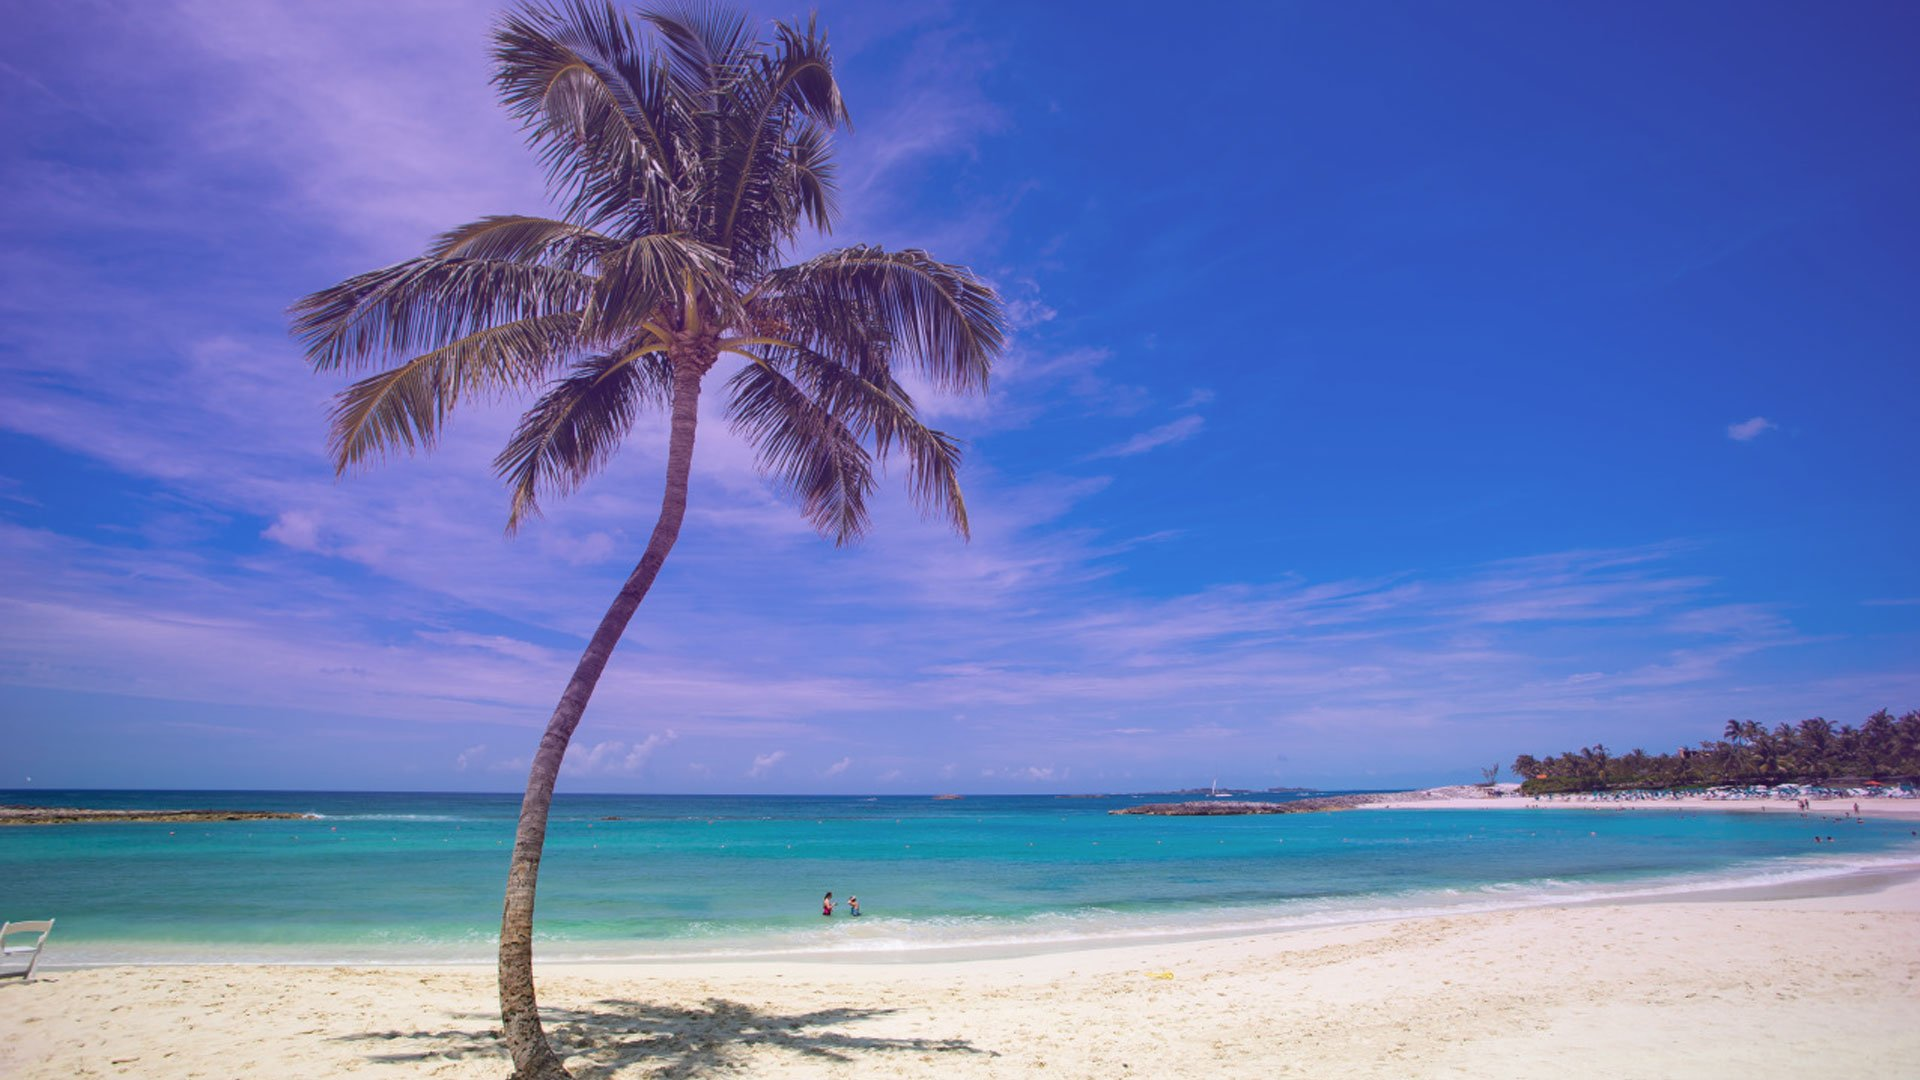 Palm Tree Screensaver wallpaper photo